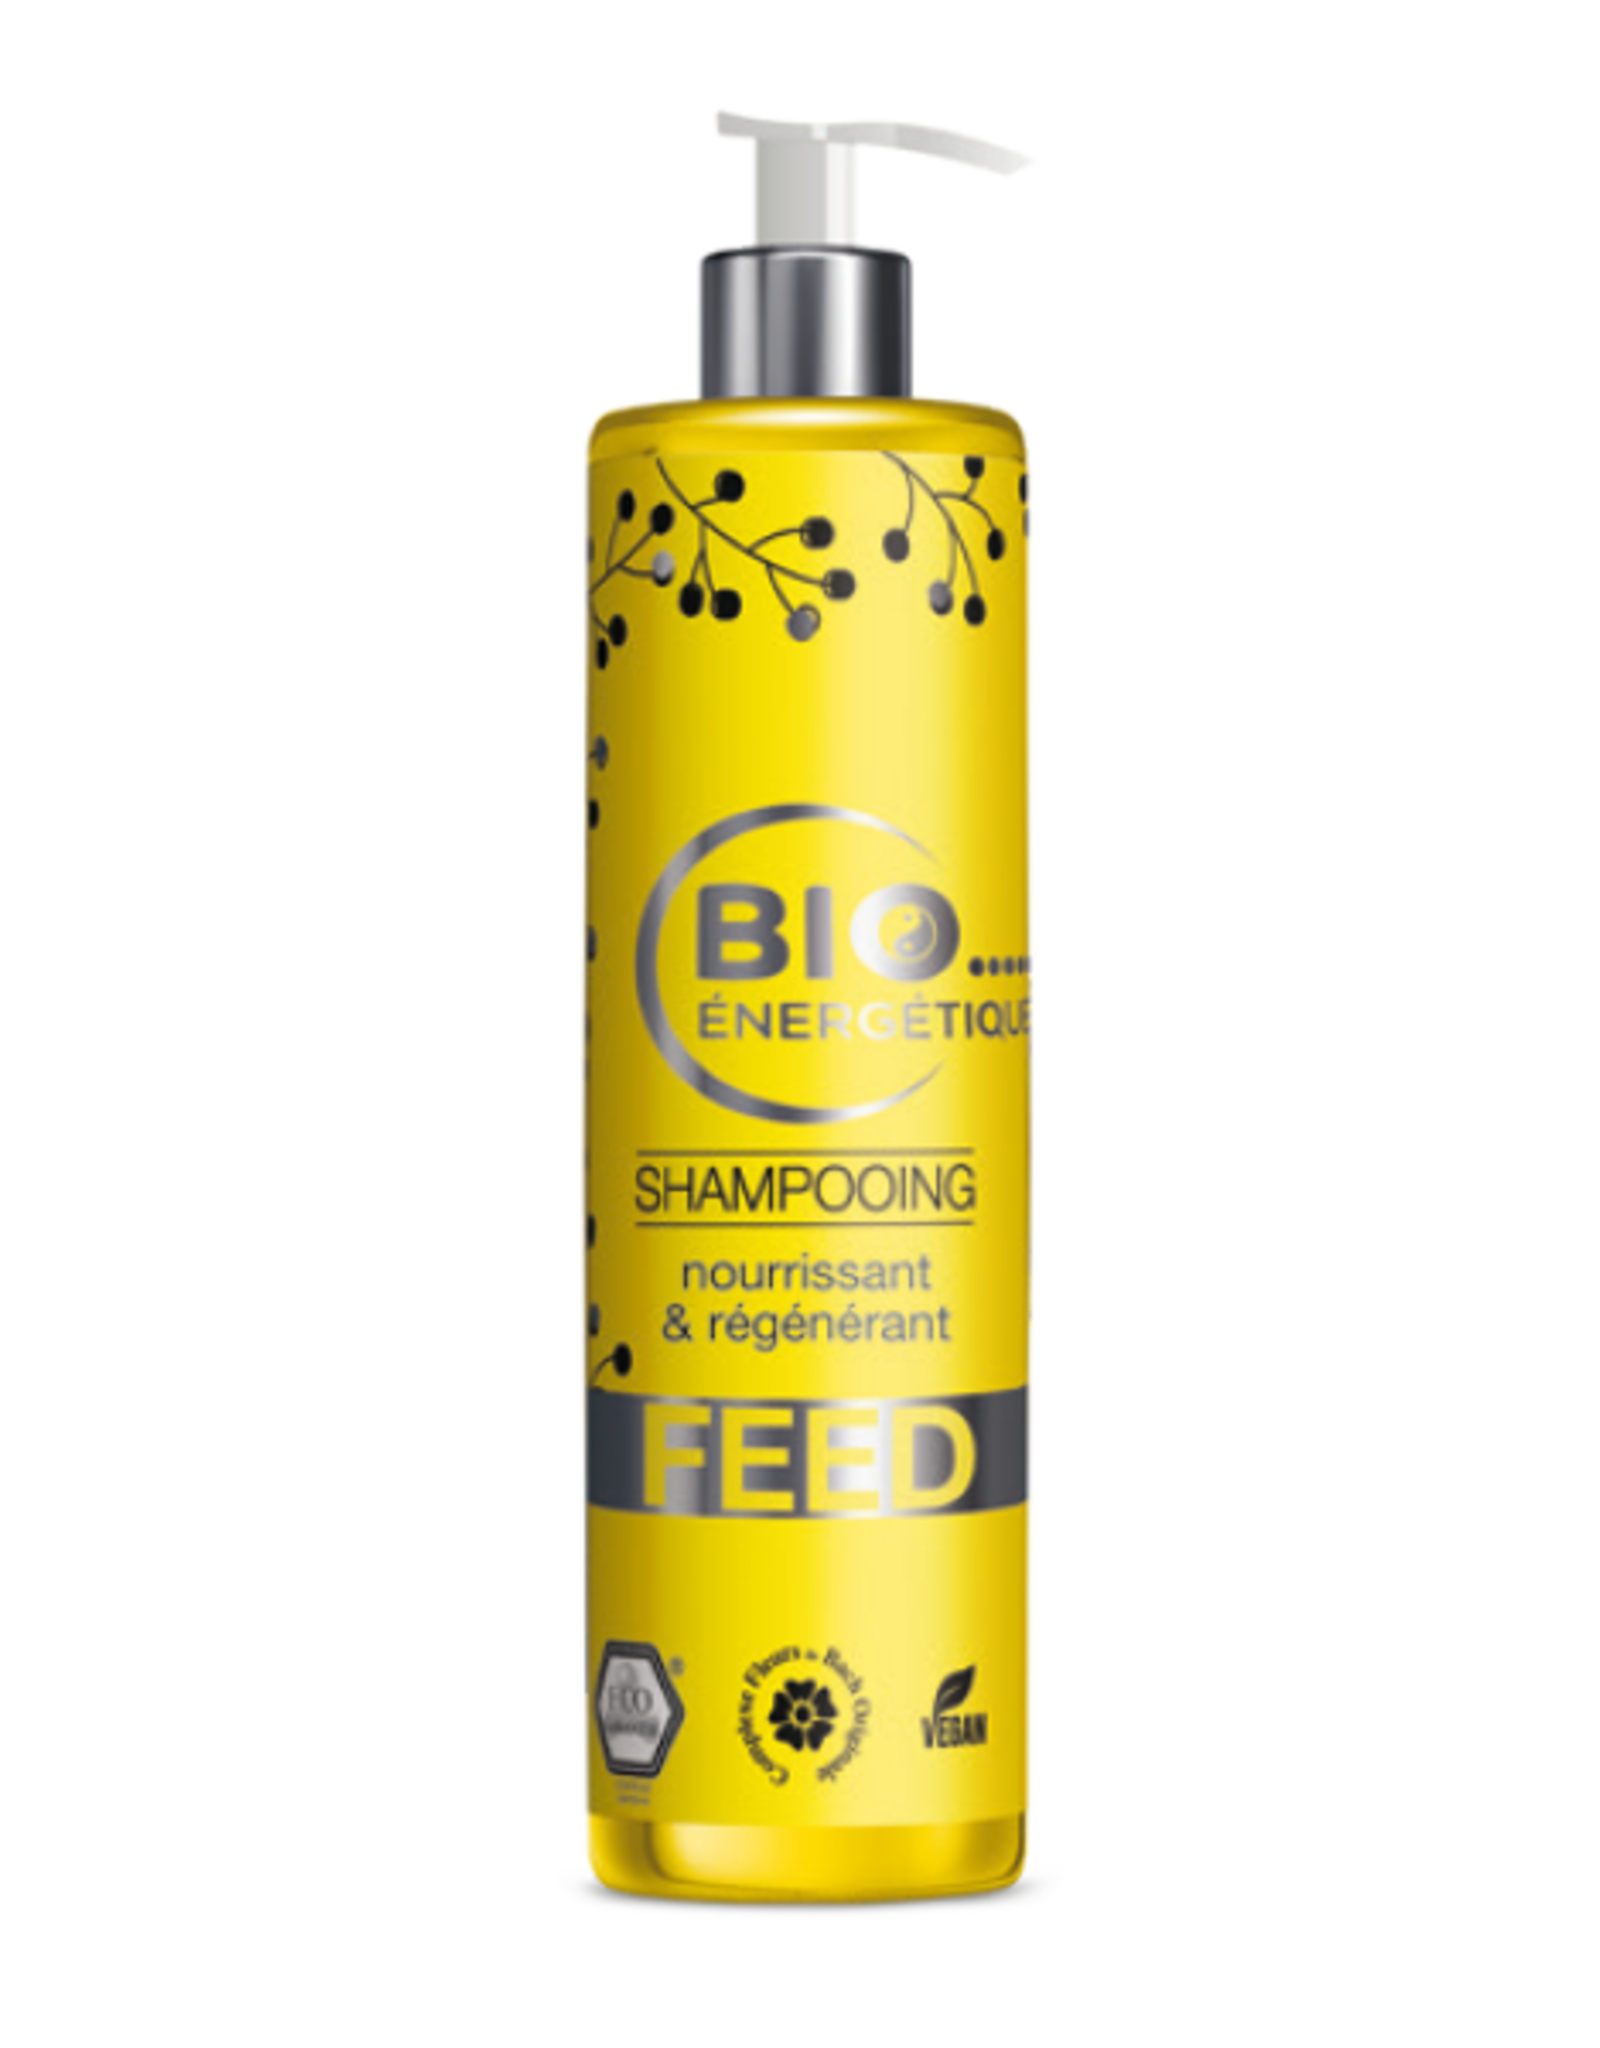 Bio Hair FEED Shampoo / Nourishing & Regenerating